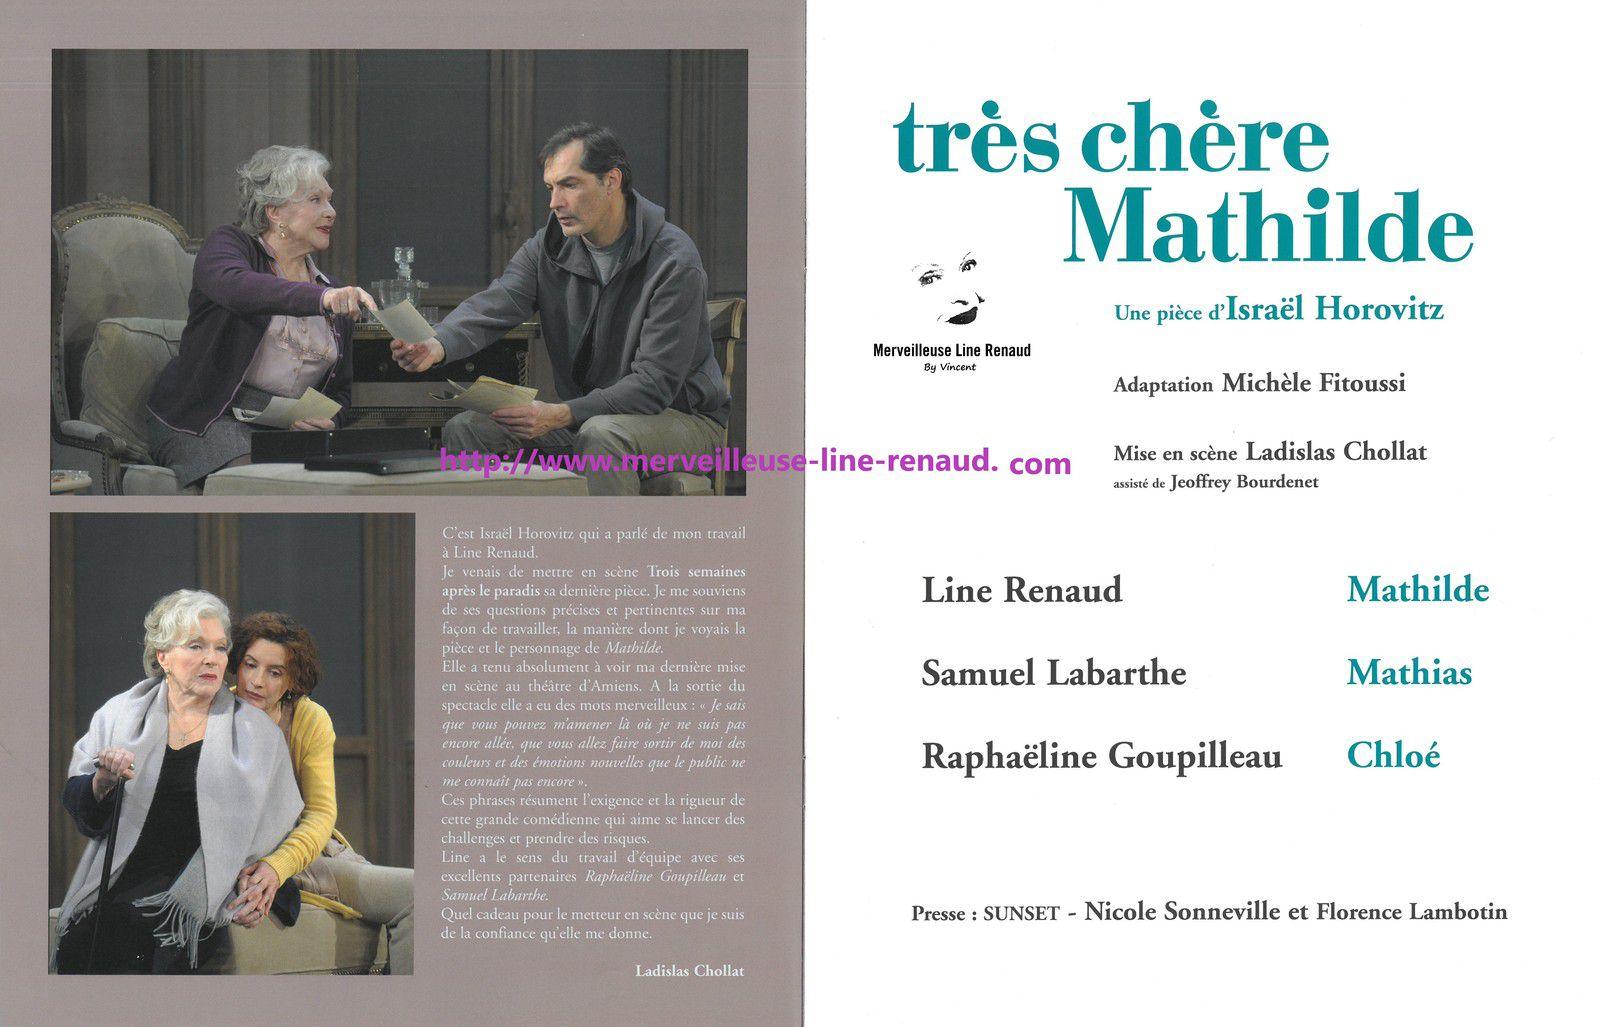 PROGRAMME: Très chère Mathilde